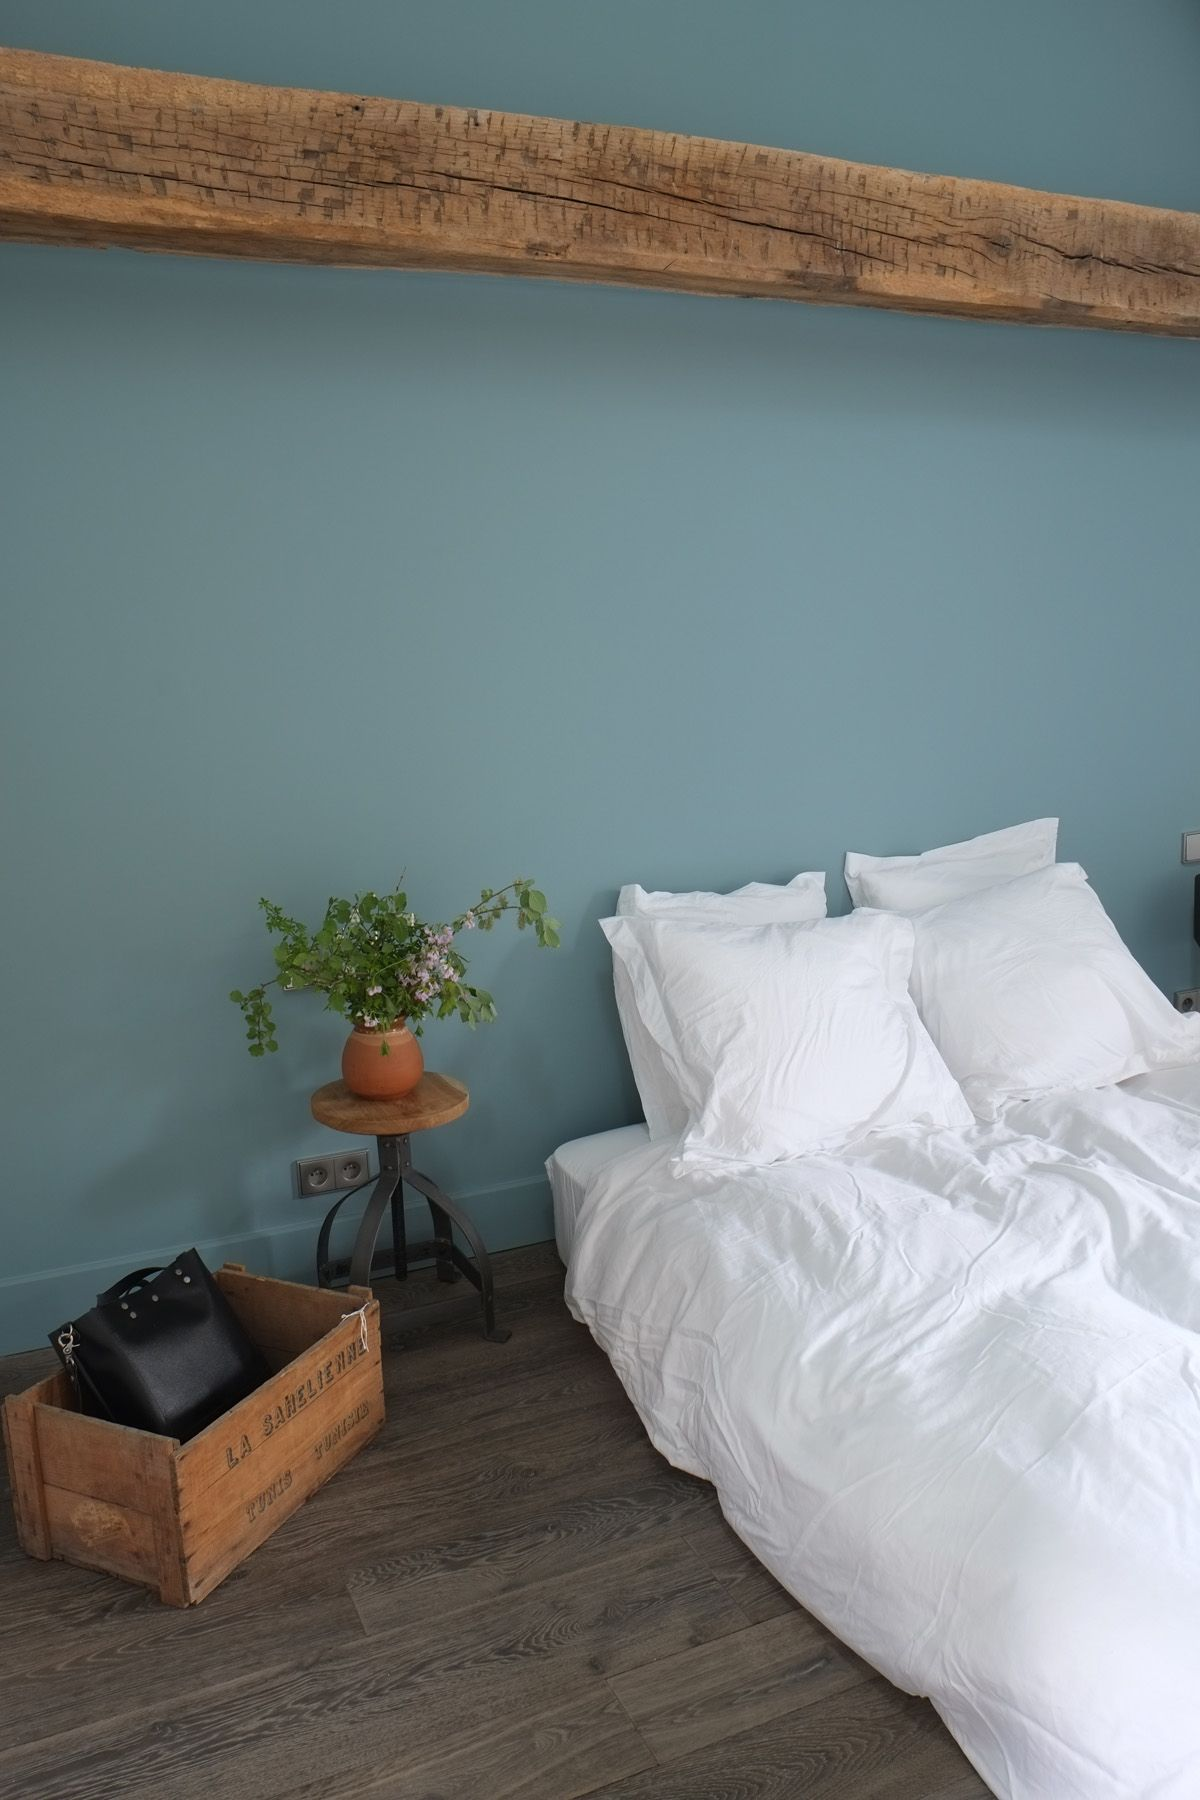 chambre d amis et ses tonalités de vert